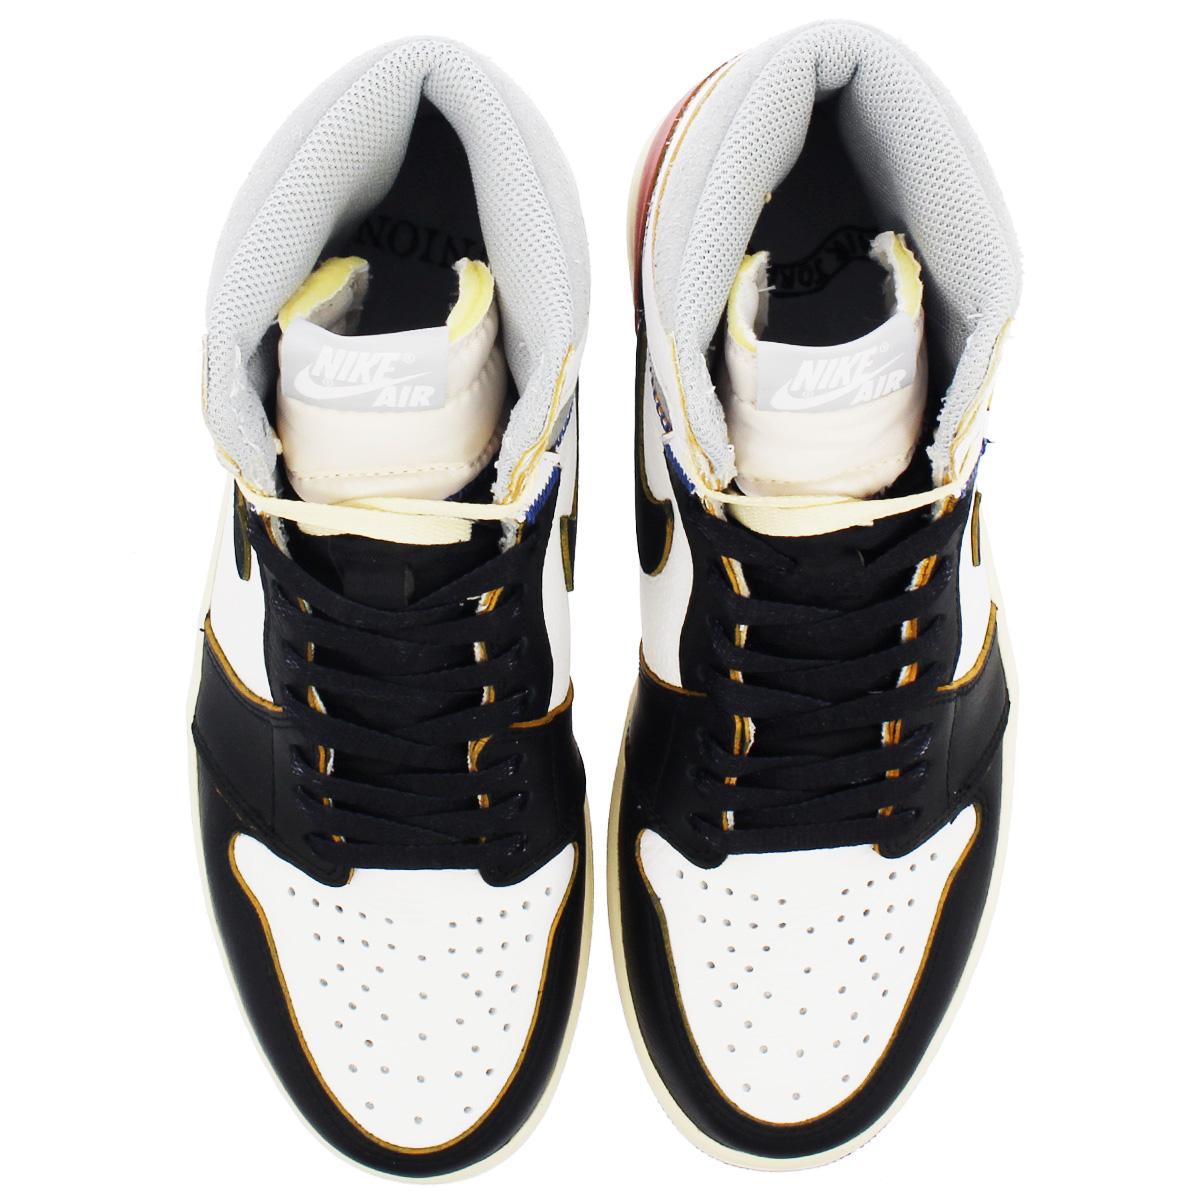 bab7e8f4fa6 NIKE AIR JORDAN 1 RETRO HIGH OG NRG Nike Air Jordan 1 nostalgic high OG NRG  union WHITE VARSITY RED WOLF GREY BLACK bv1300-106